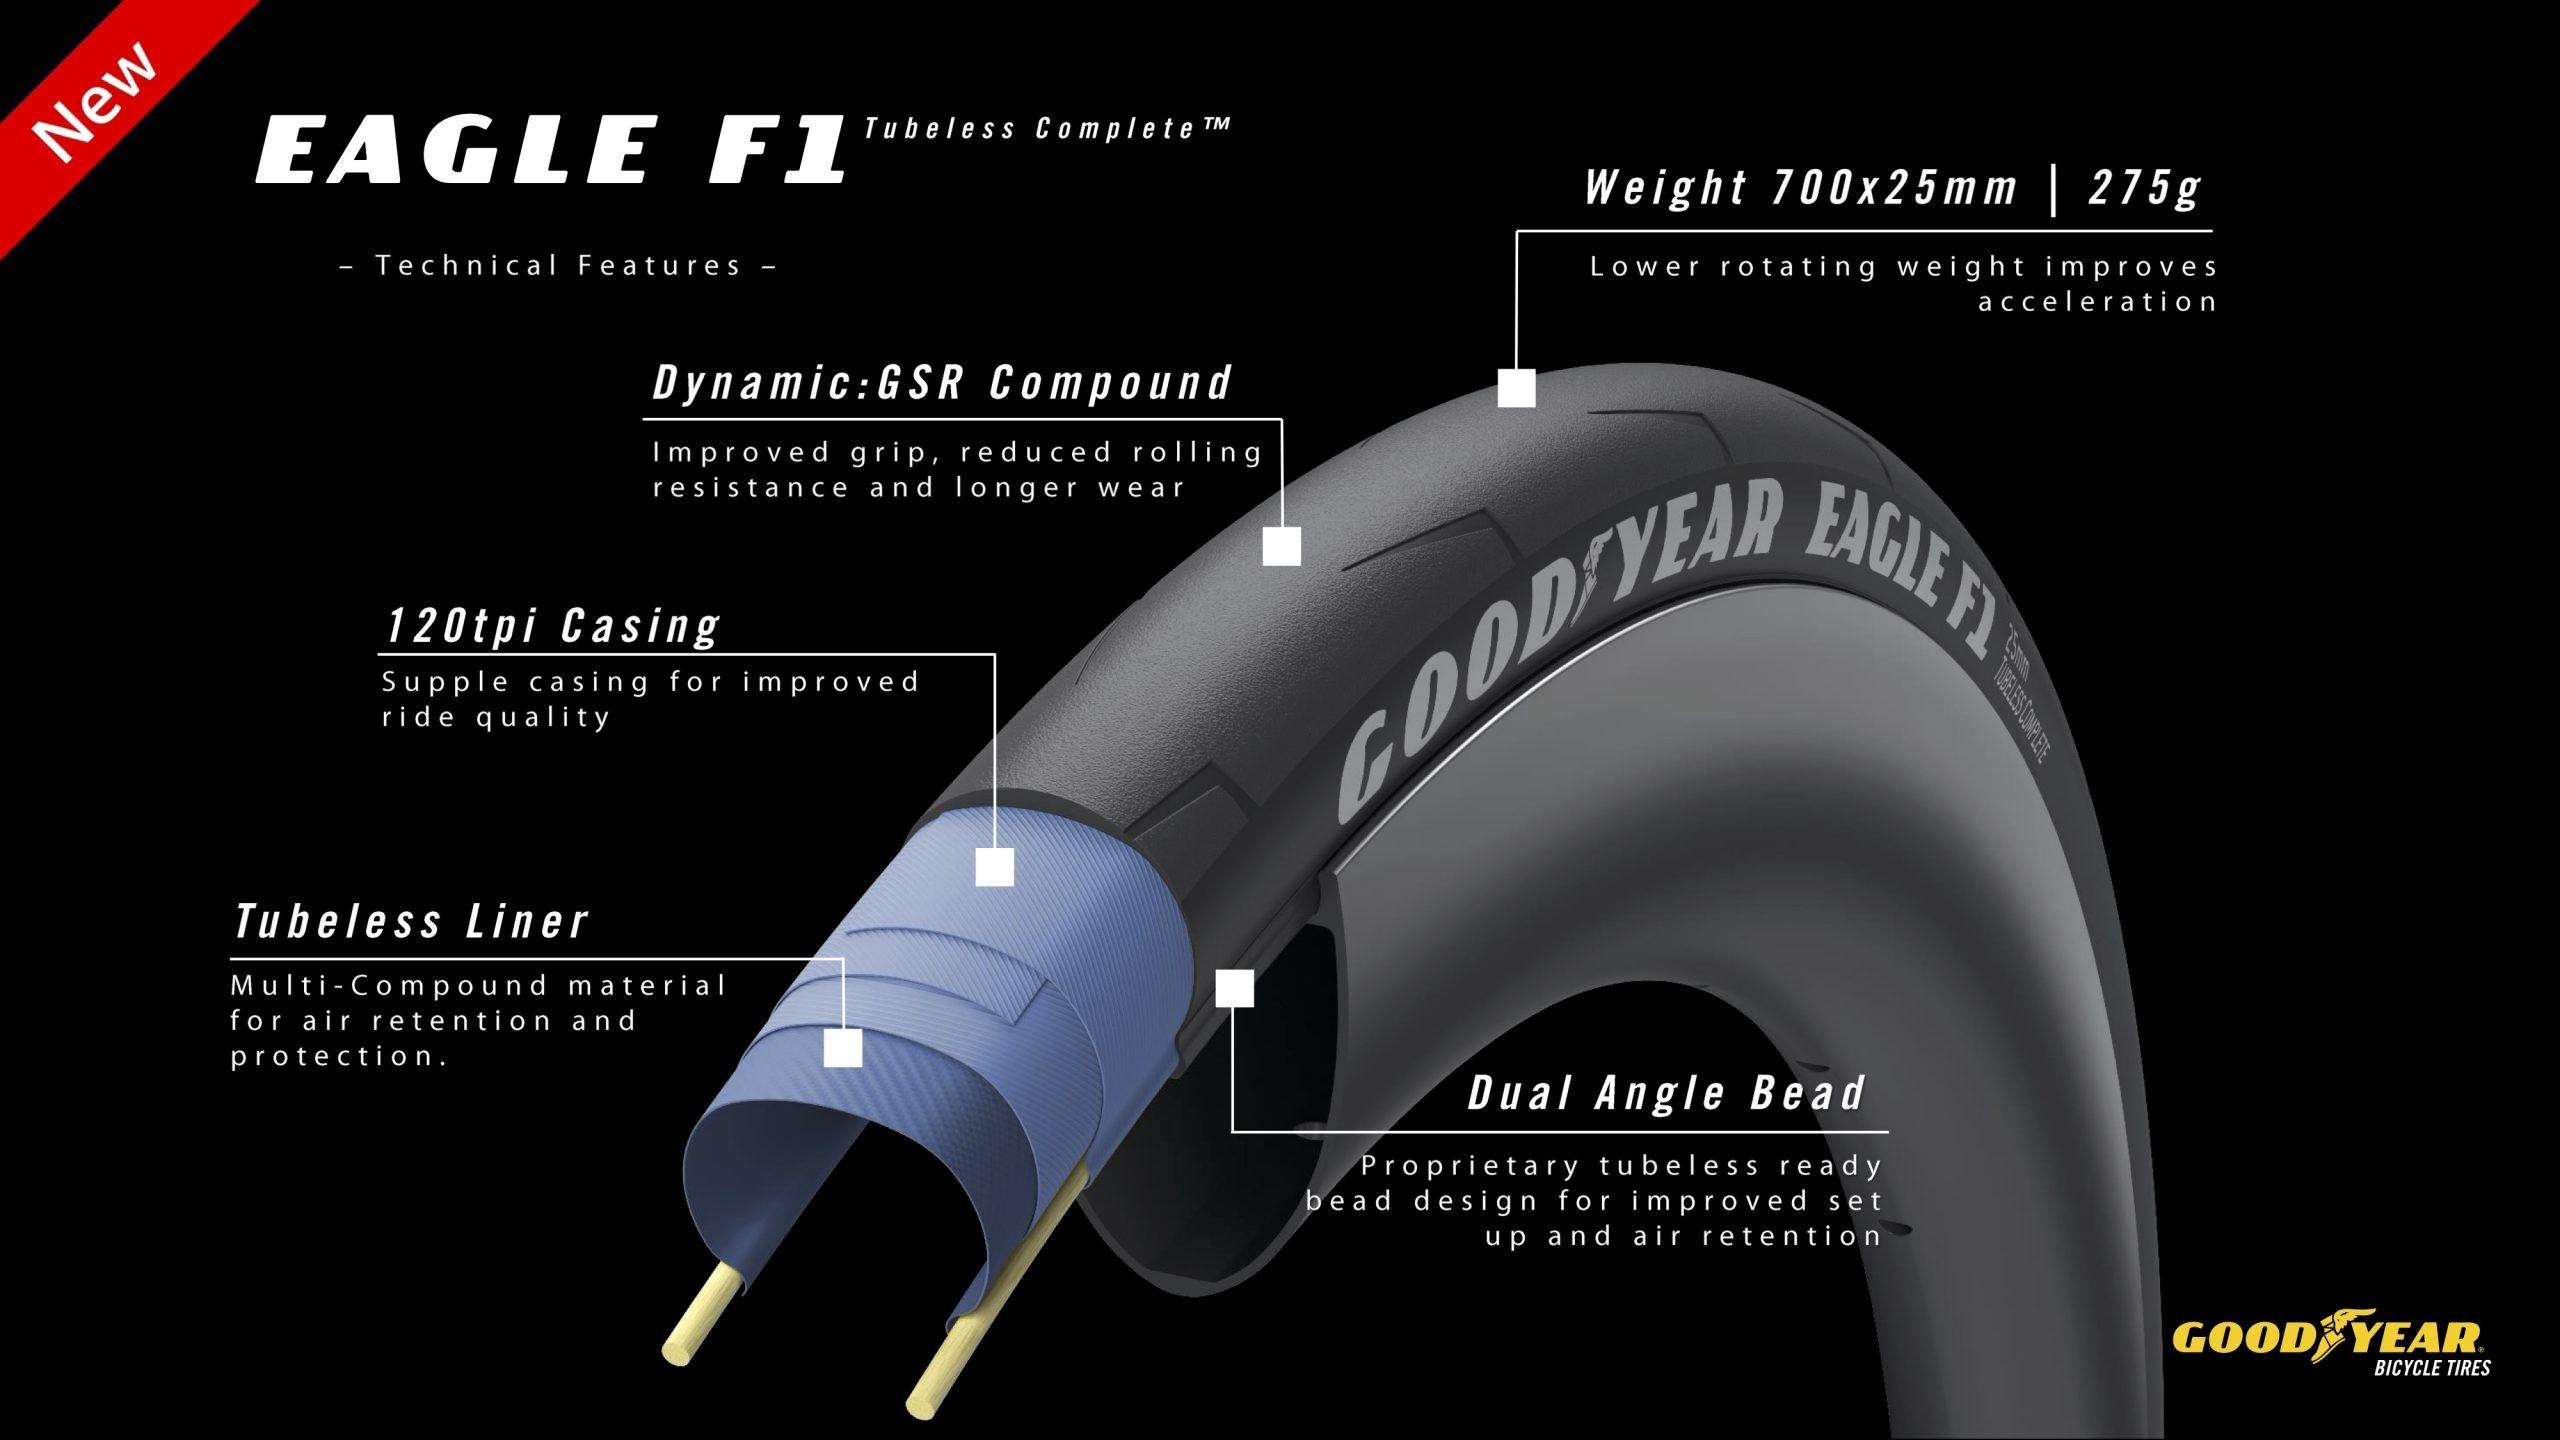 Eagle F1 Tubeless Complete